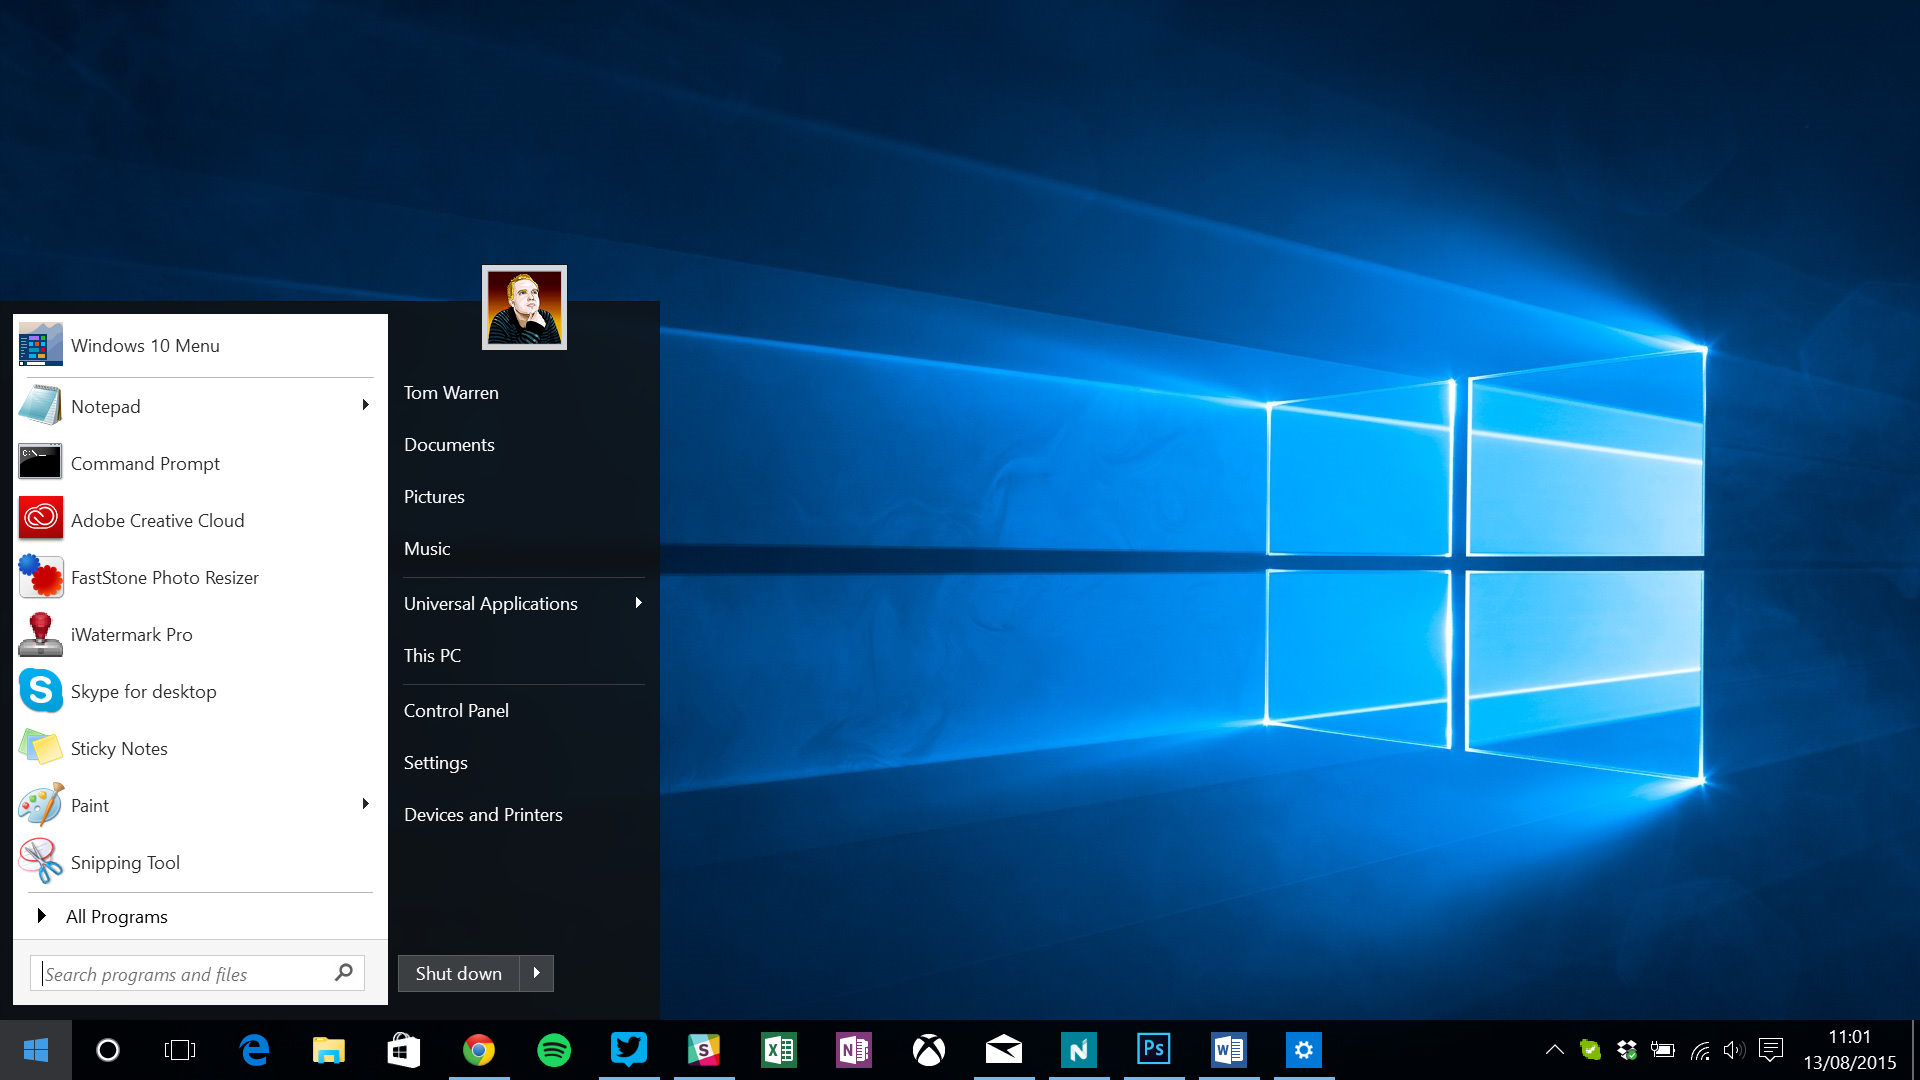 Start10 brings the old Windows 7 Start menu back to Windows 10 - The